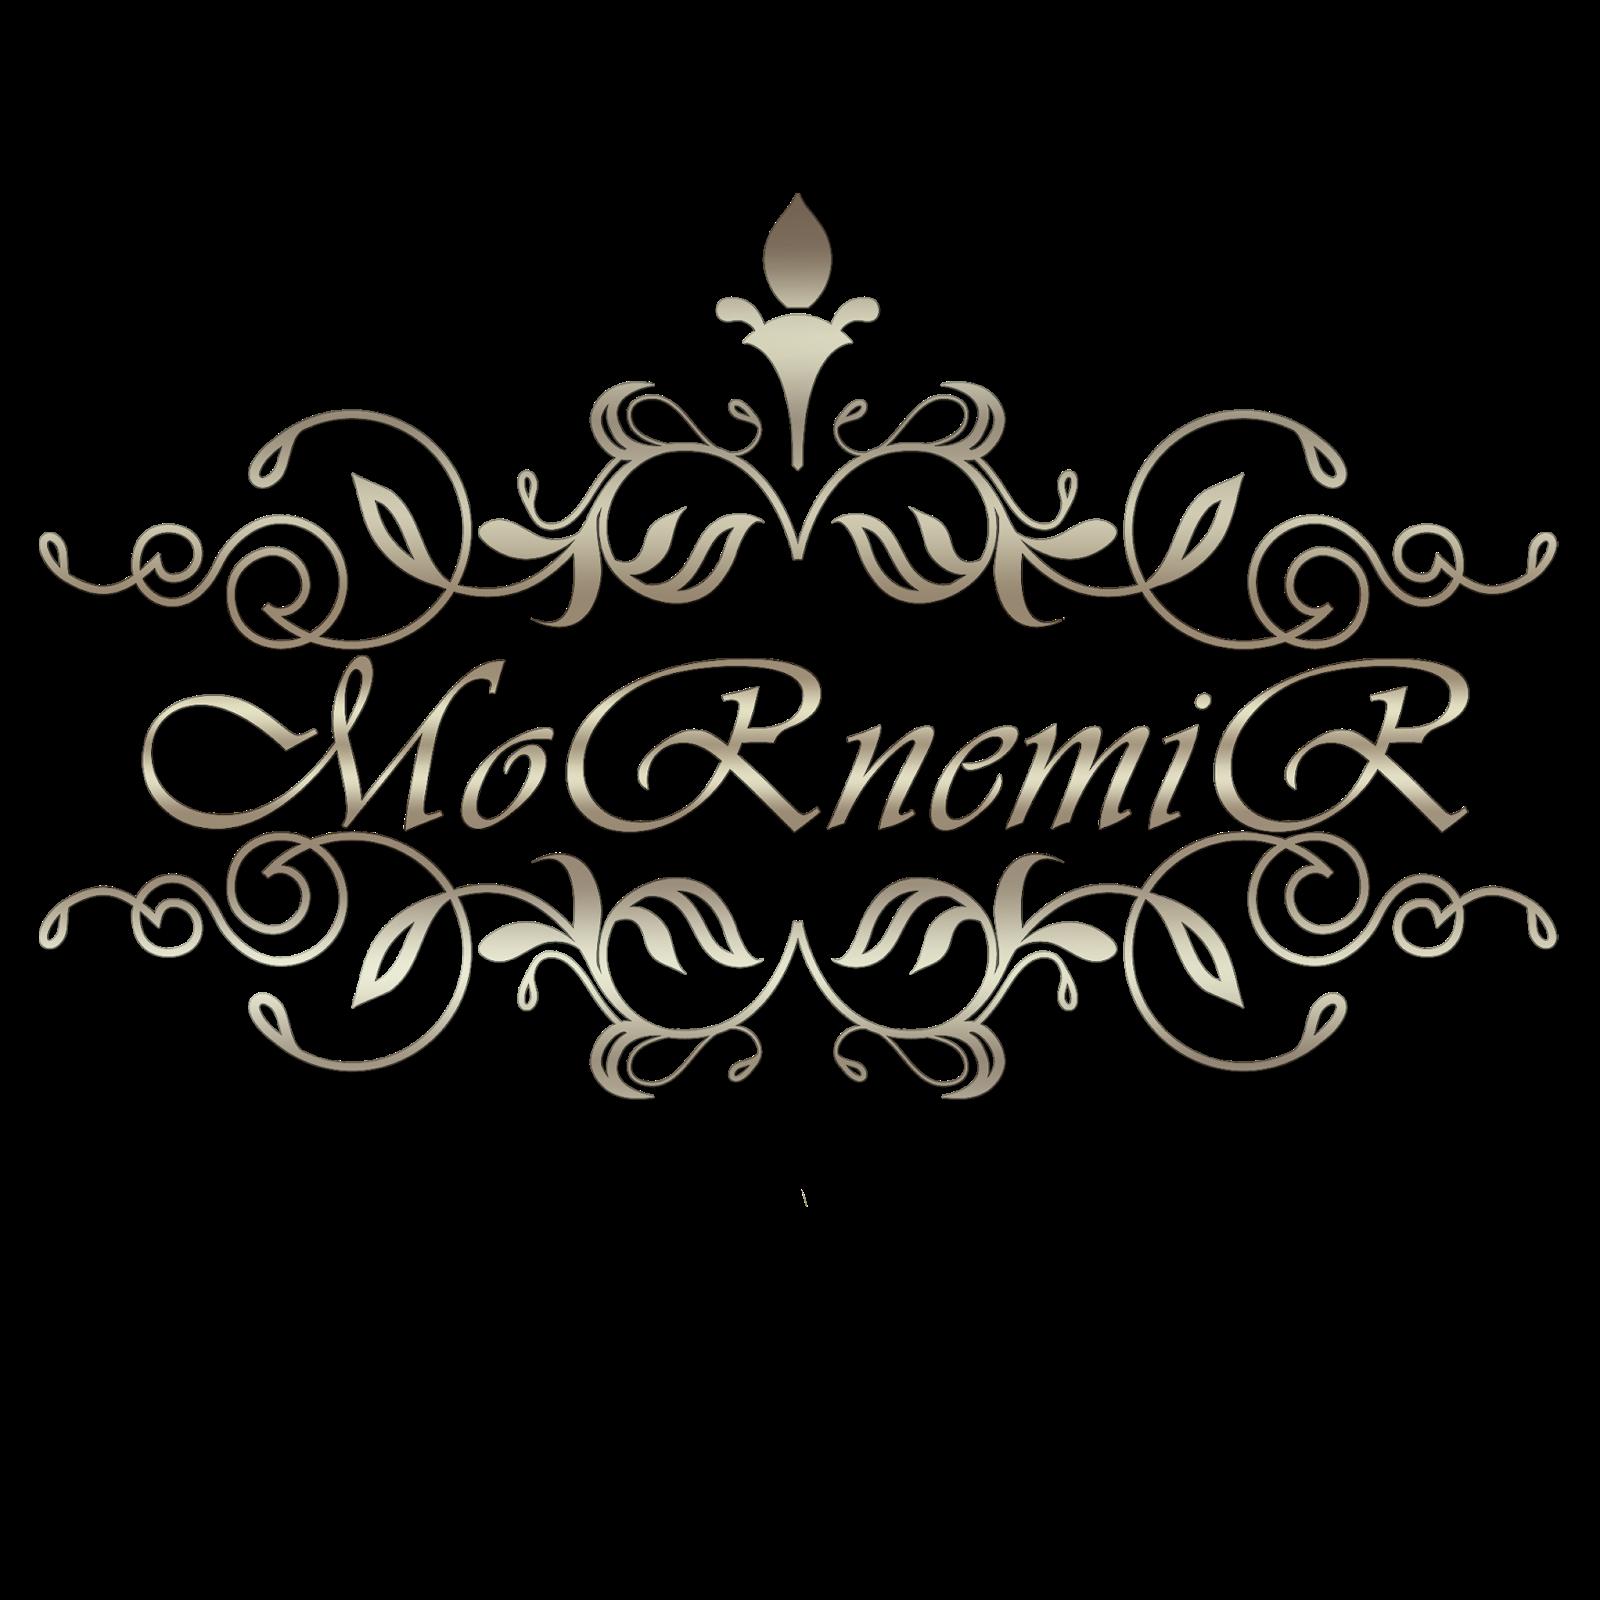 Mornemir